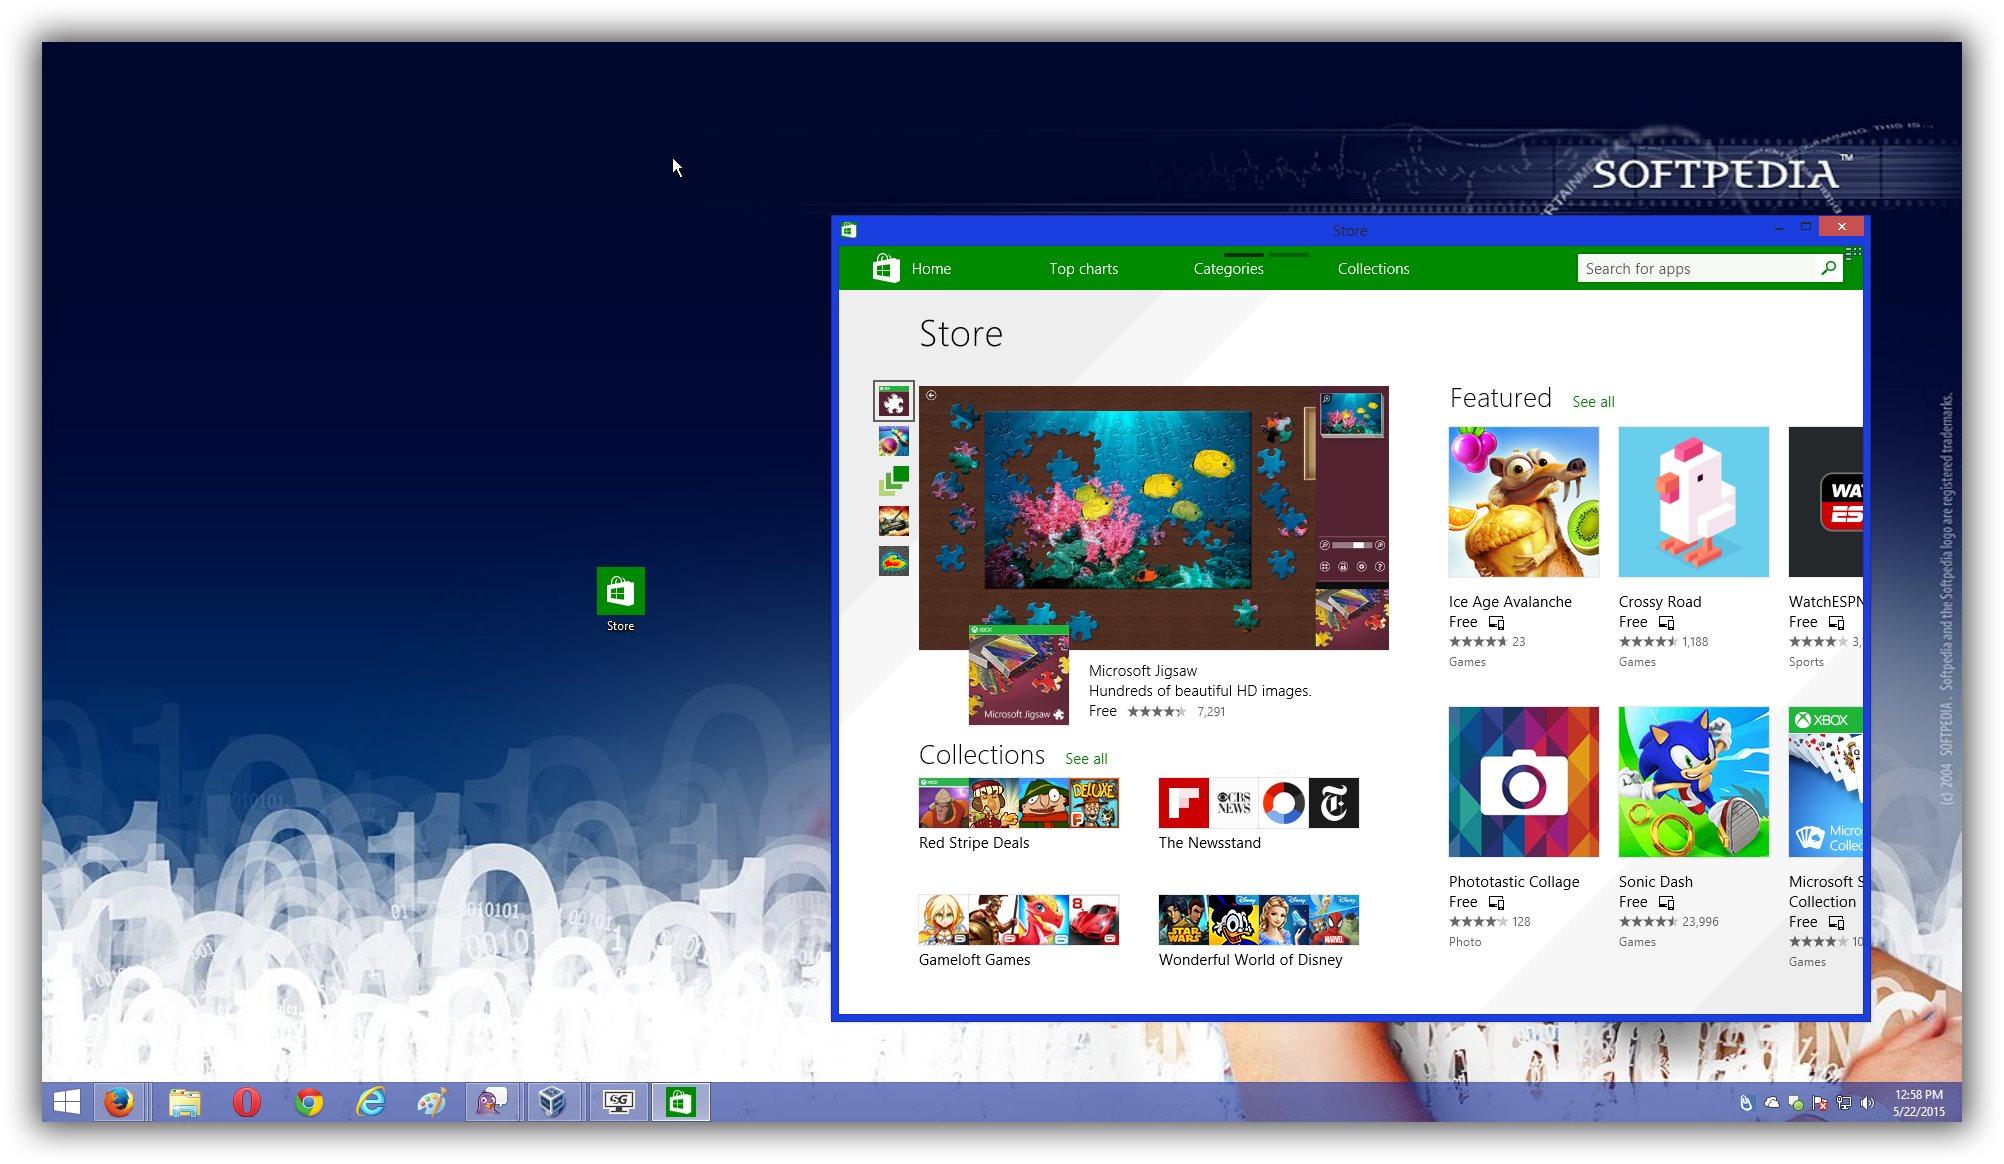 Preparing for Windows 10: Metro Apps on Your Desktop